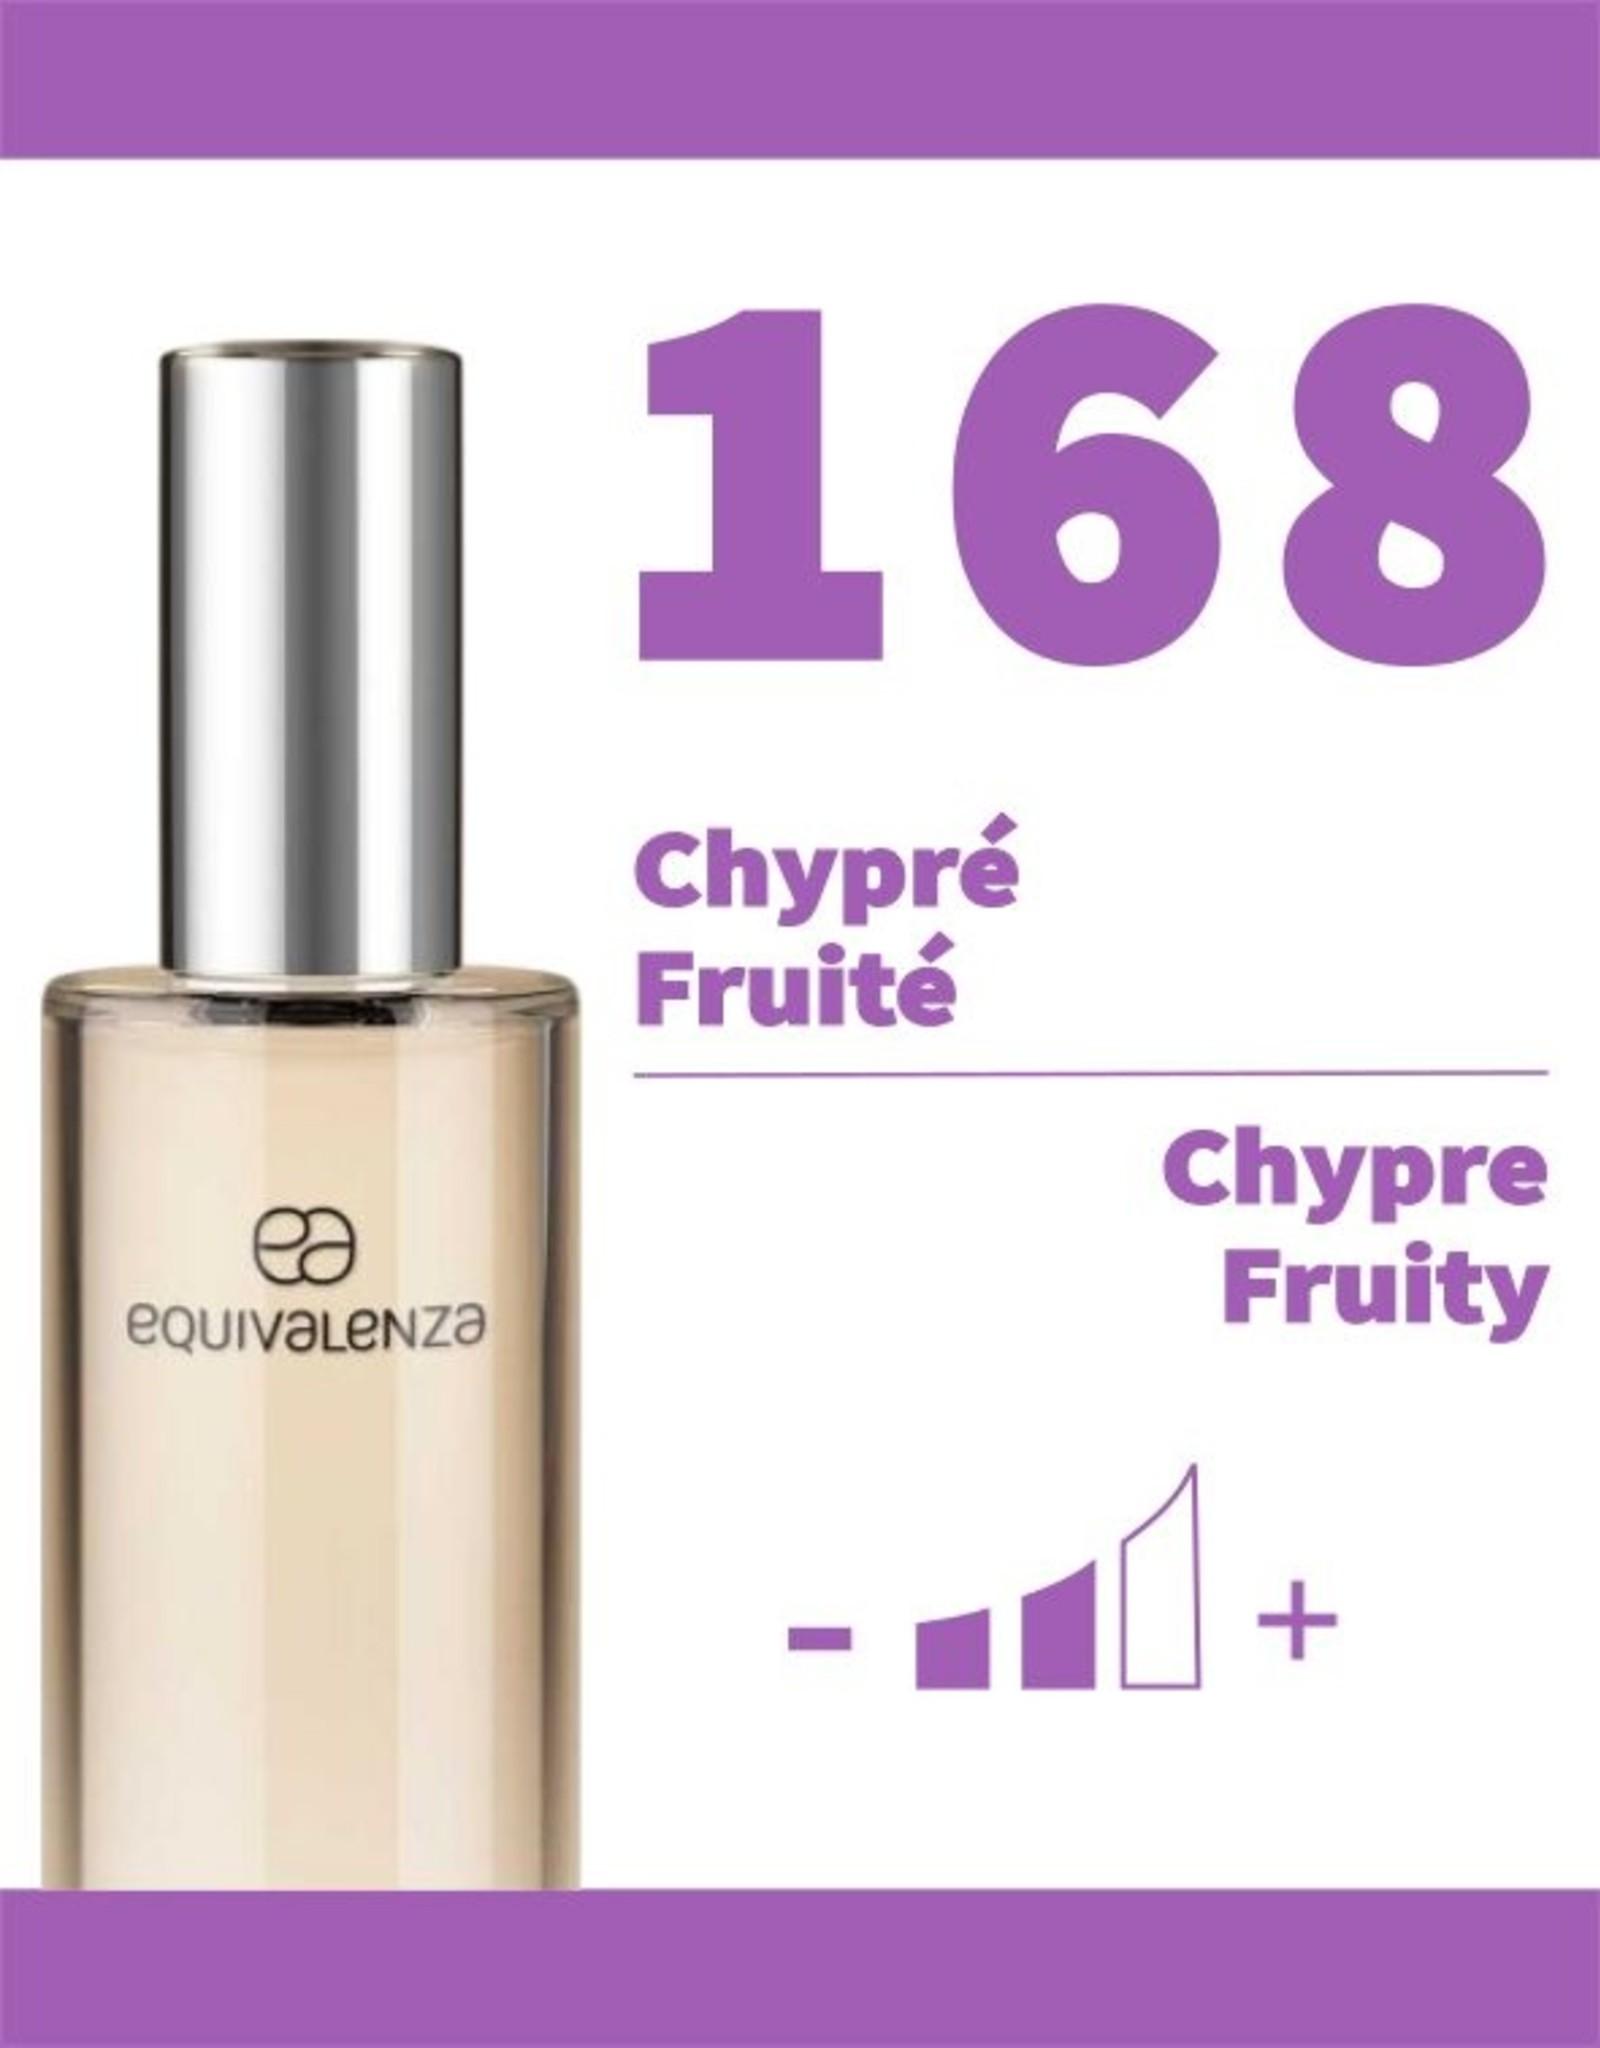 Equivalenza Chypre Fruity 168